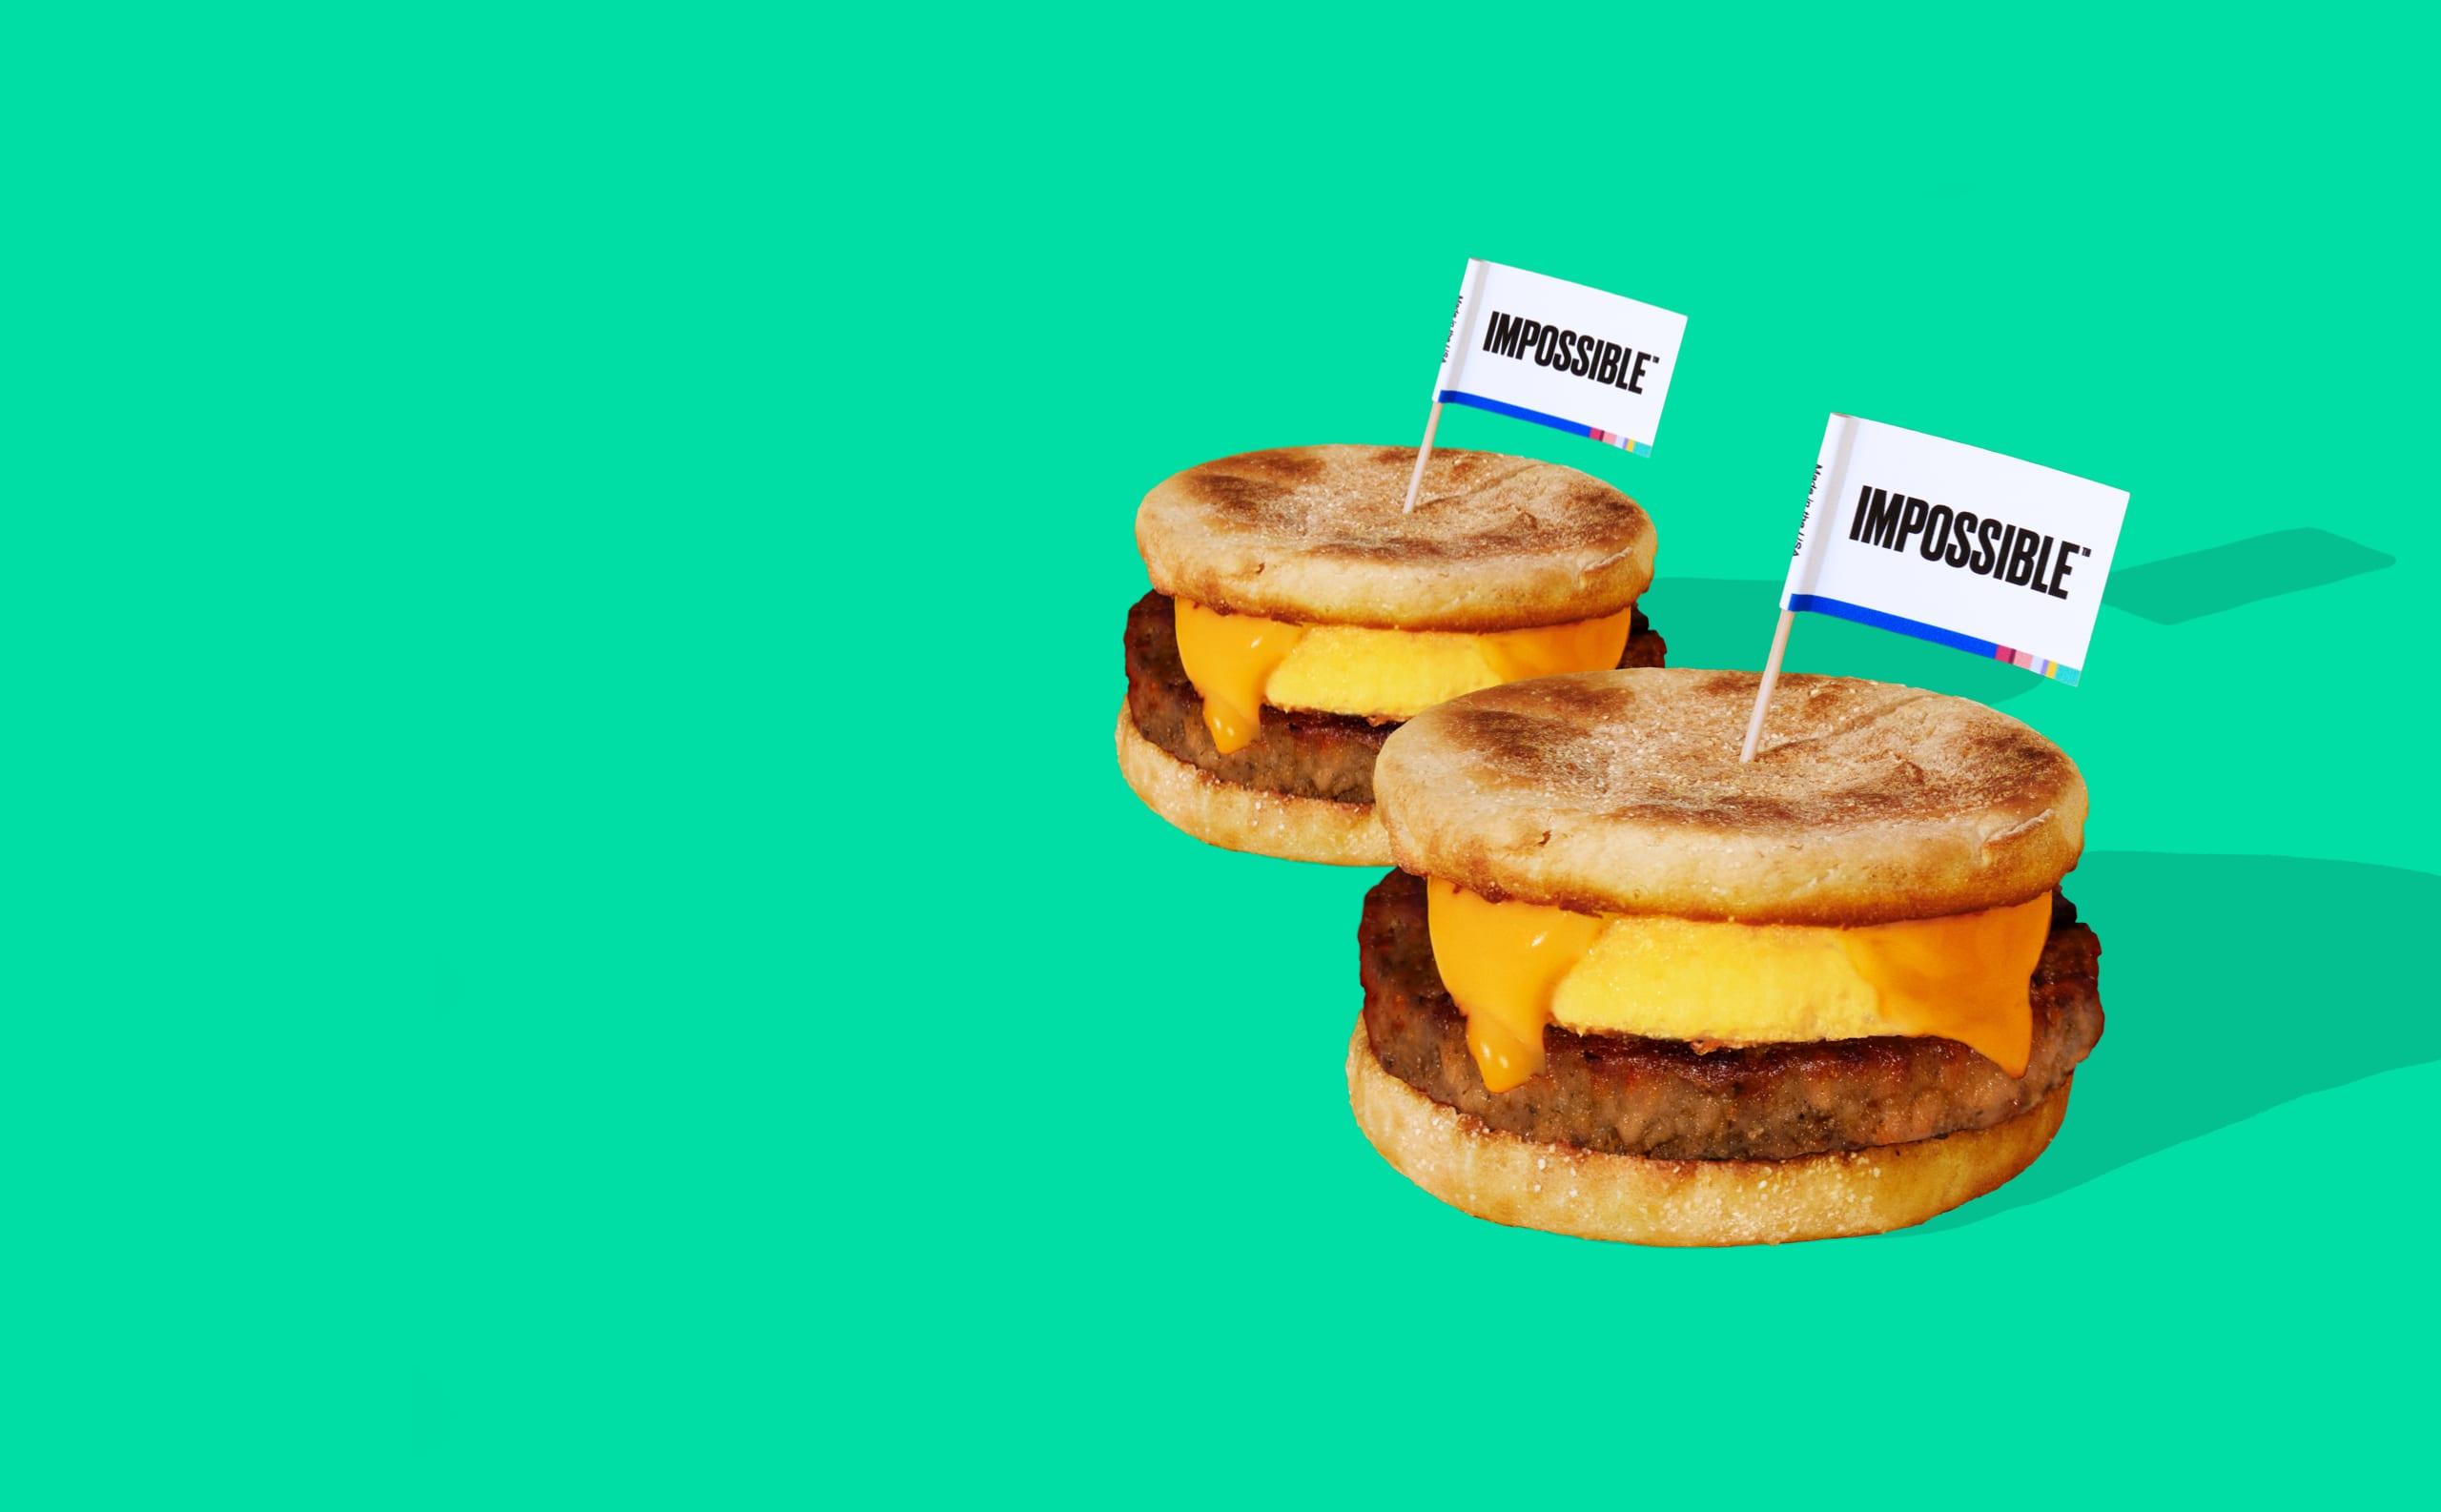 Sell Sausage Plant Based Diet Breakfast Plant Based Breakfast Sandwich on green background